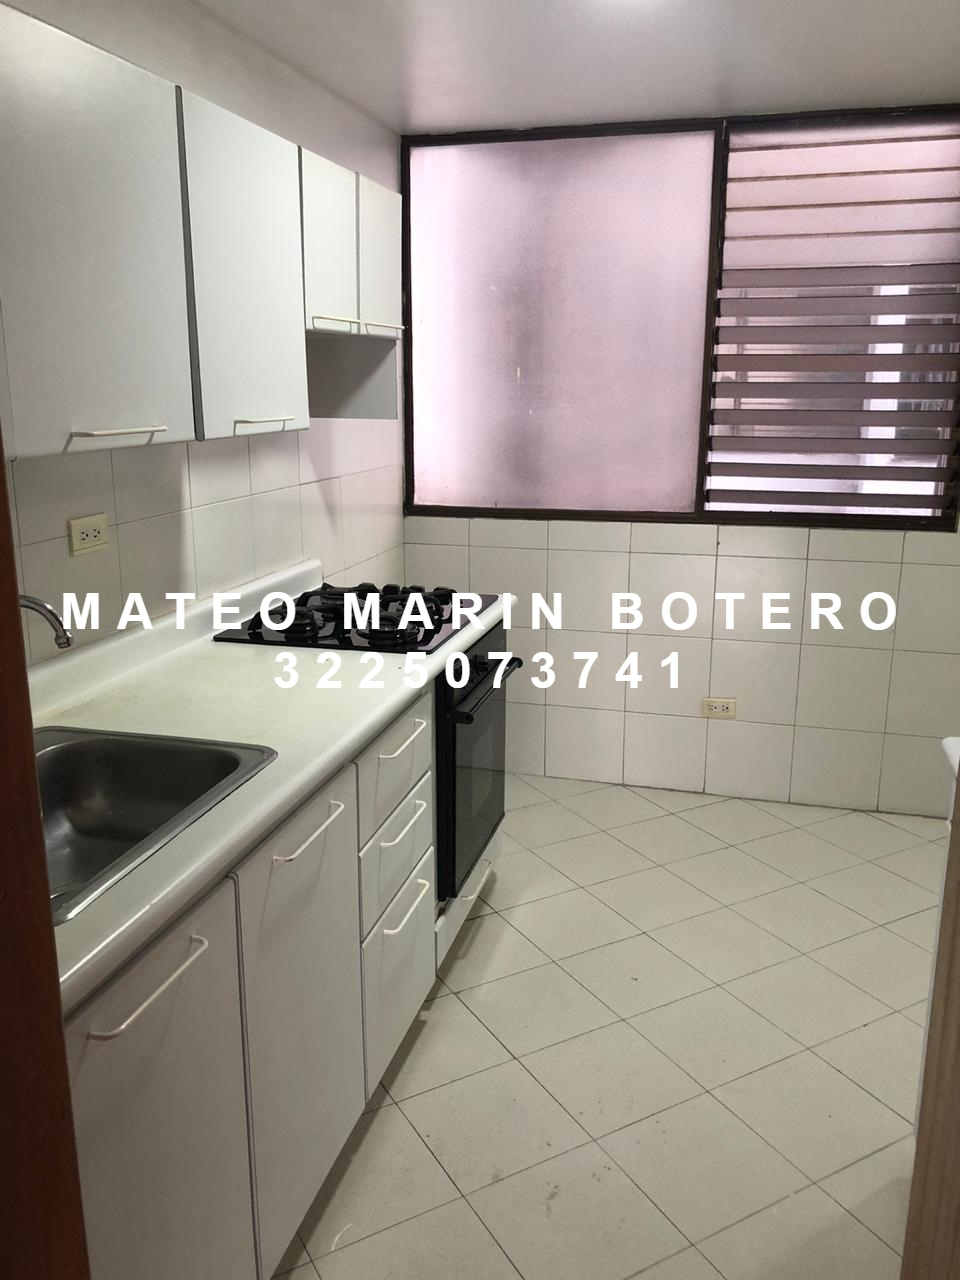 AVOC-0063 Se vende apartamento, unido a un apartaestudio.